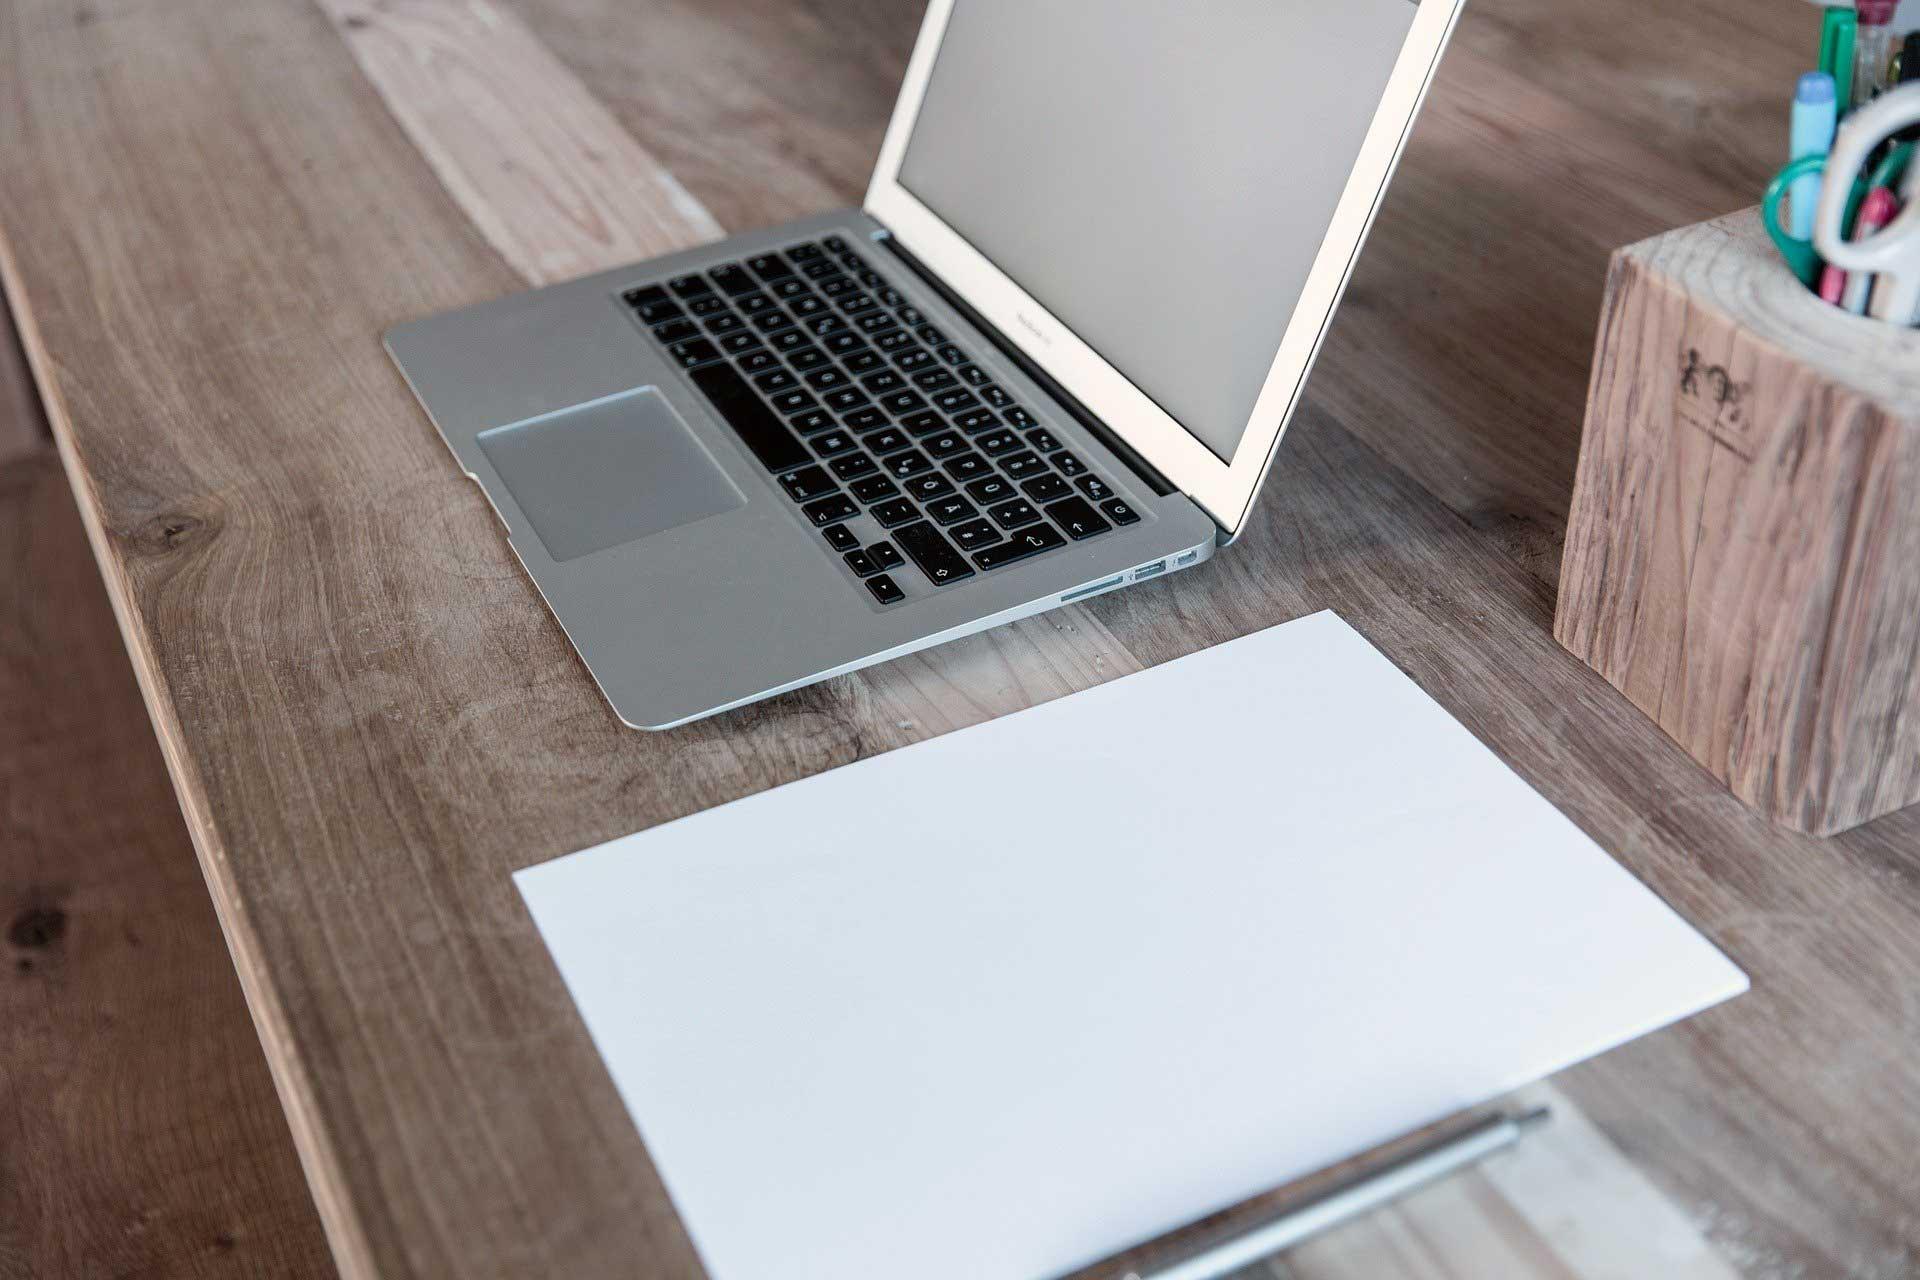 Masa uzerinde laptop ve kagit-kalem